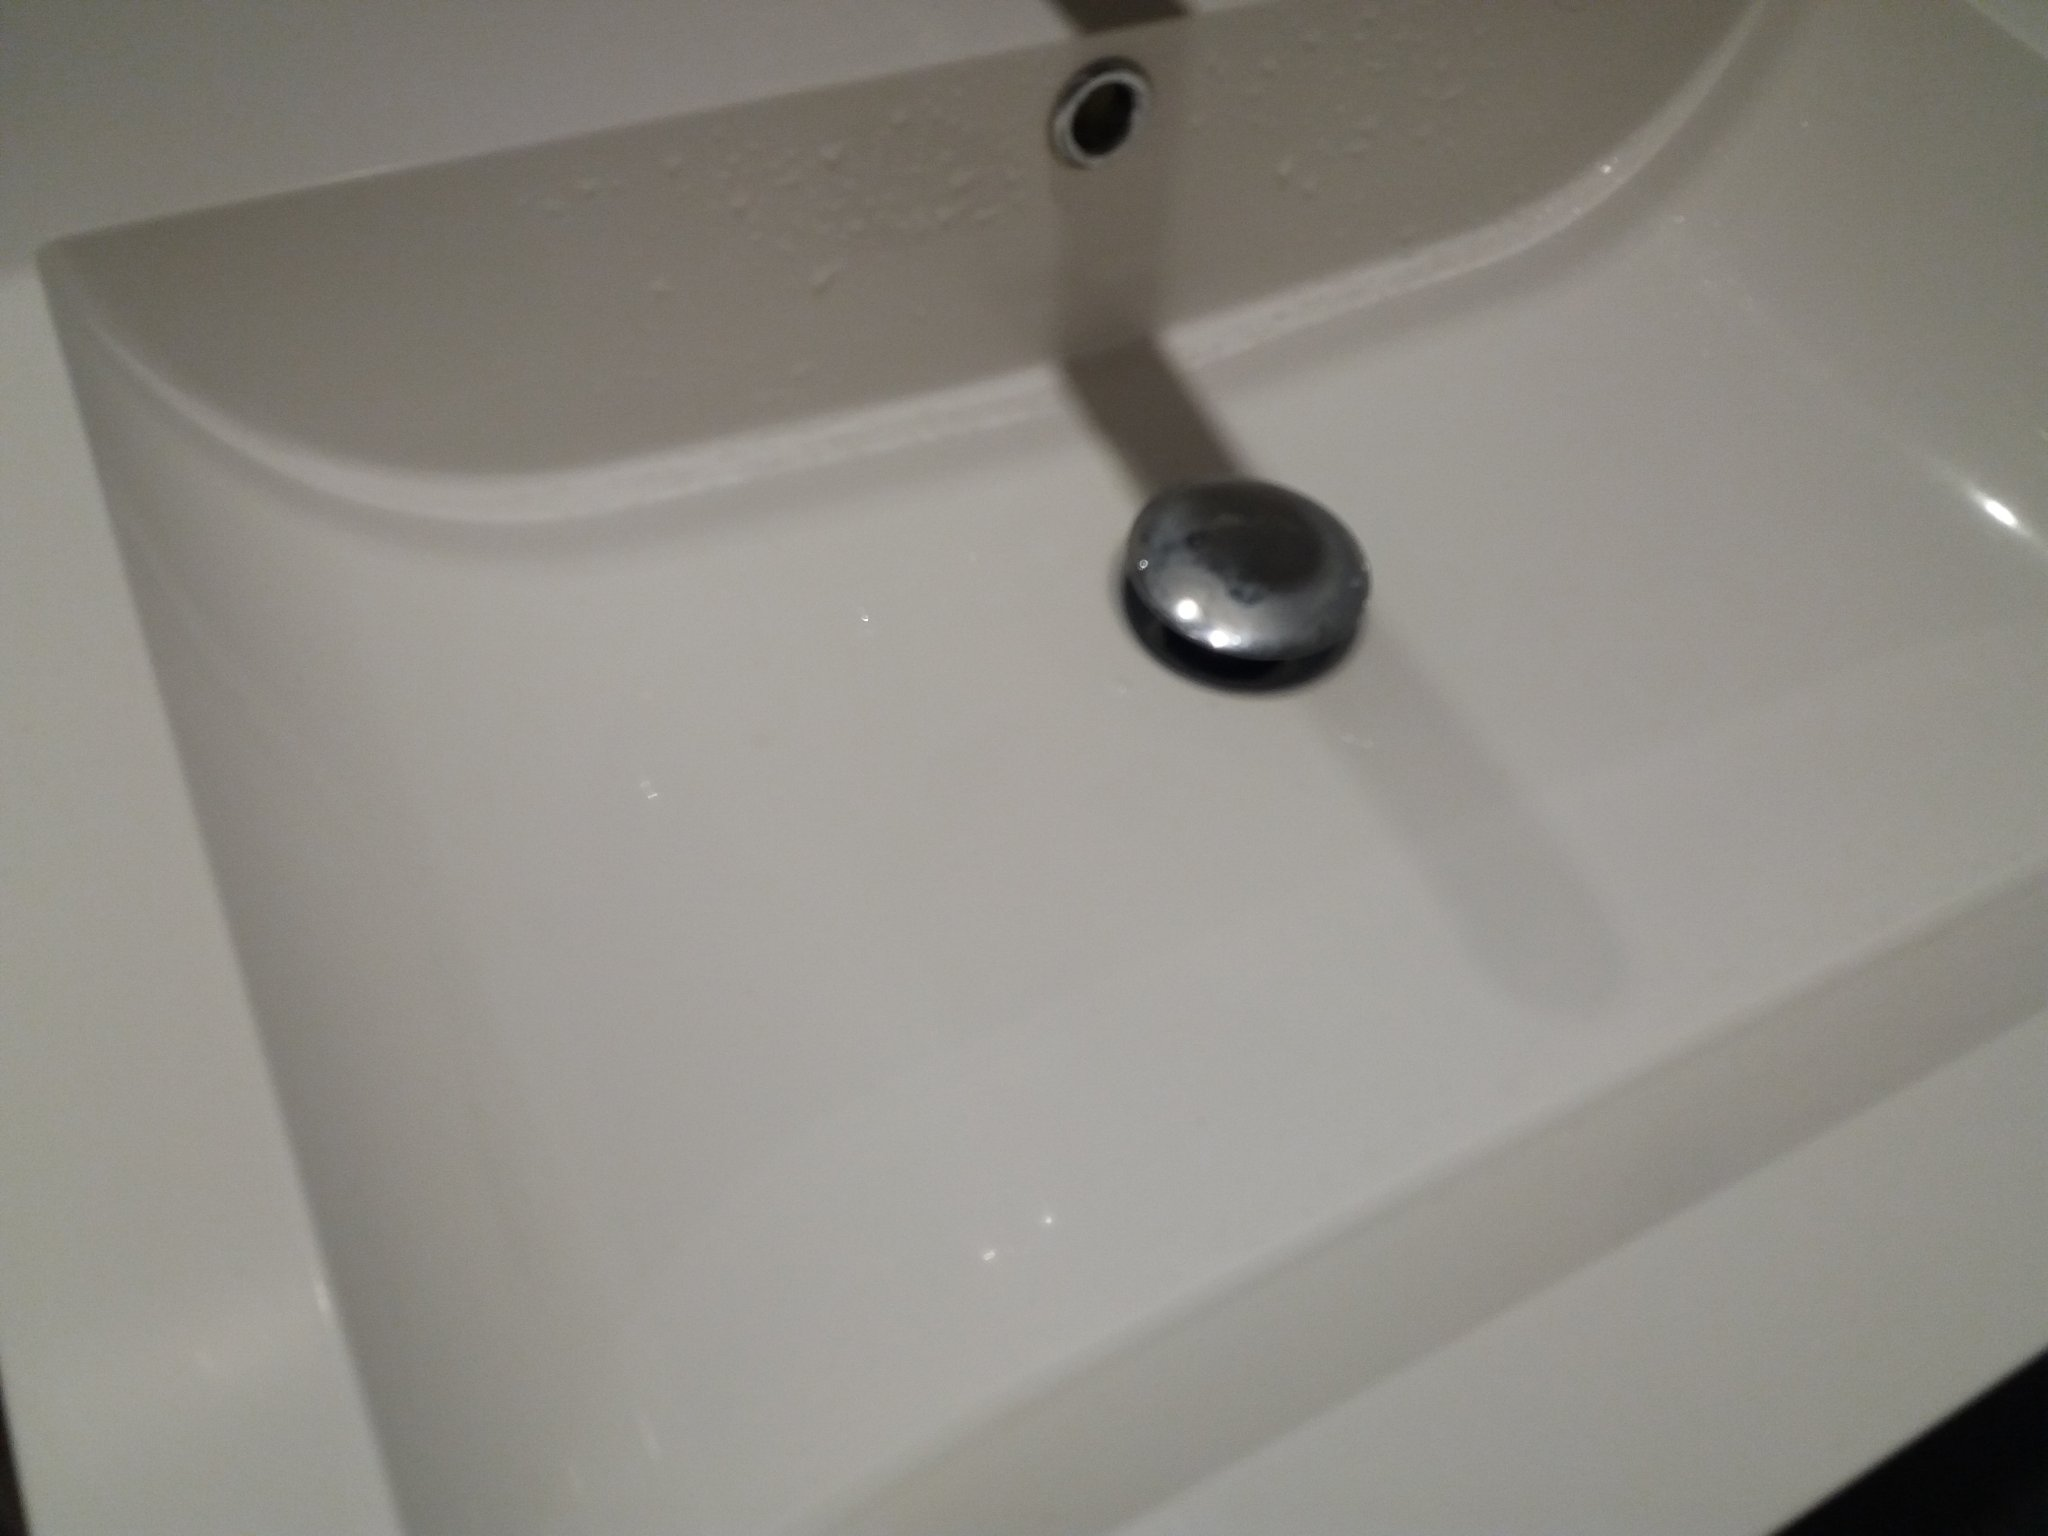 Afvoer fonteintje toilet en clickwaste vervangen wastafel badkamer